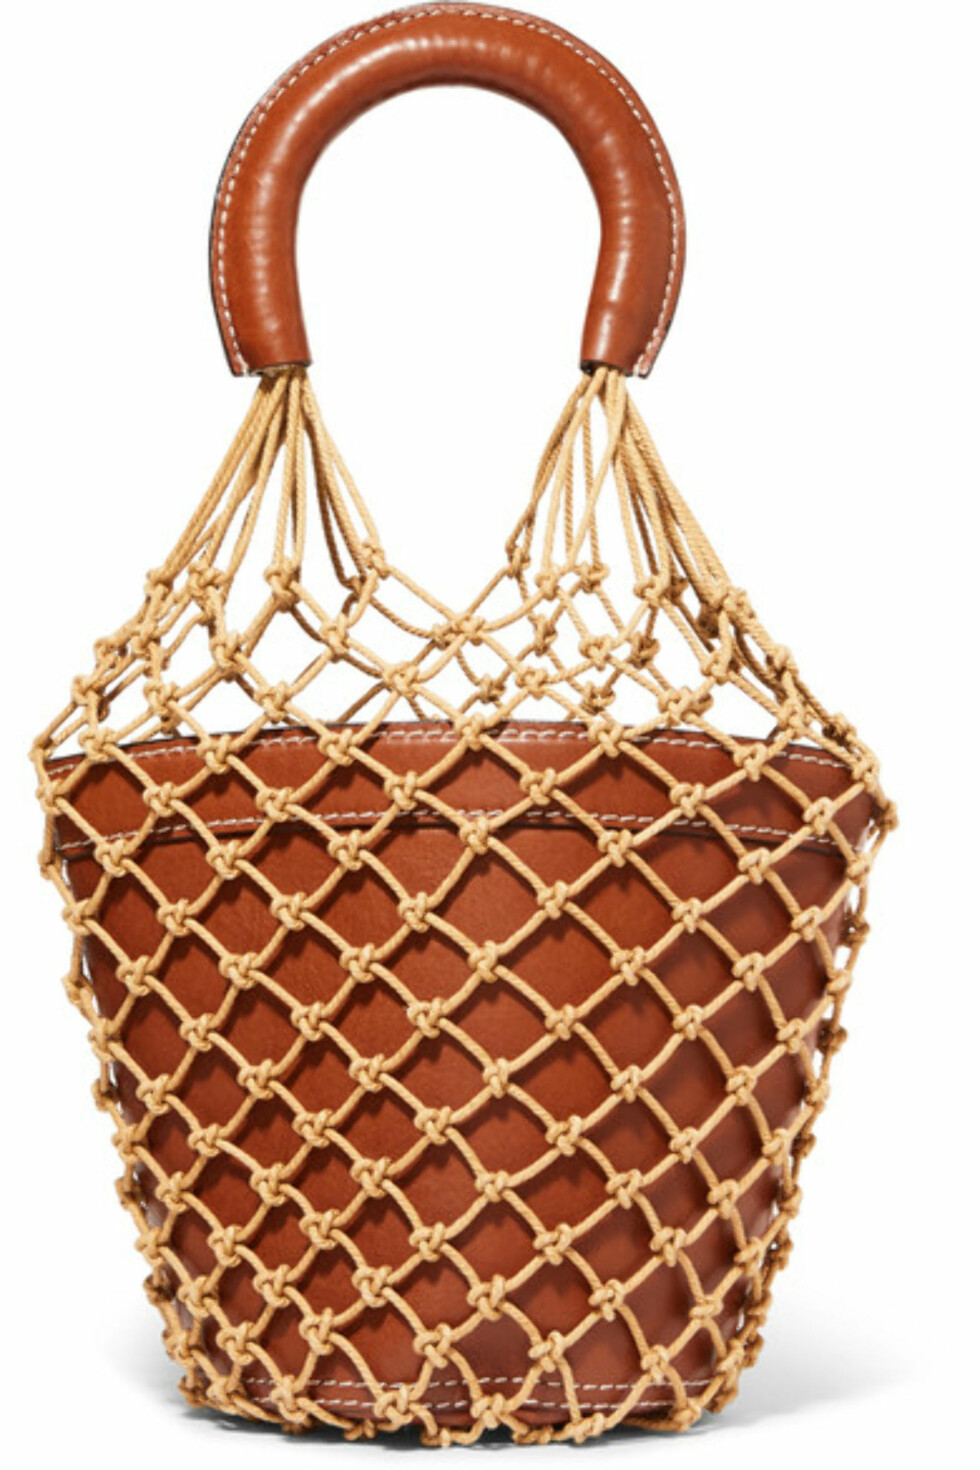 Nett-veske fra Staud via Net-a-porter.com | kr 4483 | https://www.net-a-porter.com/no/en/product/898400/Staud/moreau-macrame-and-leather-bucket-bag